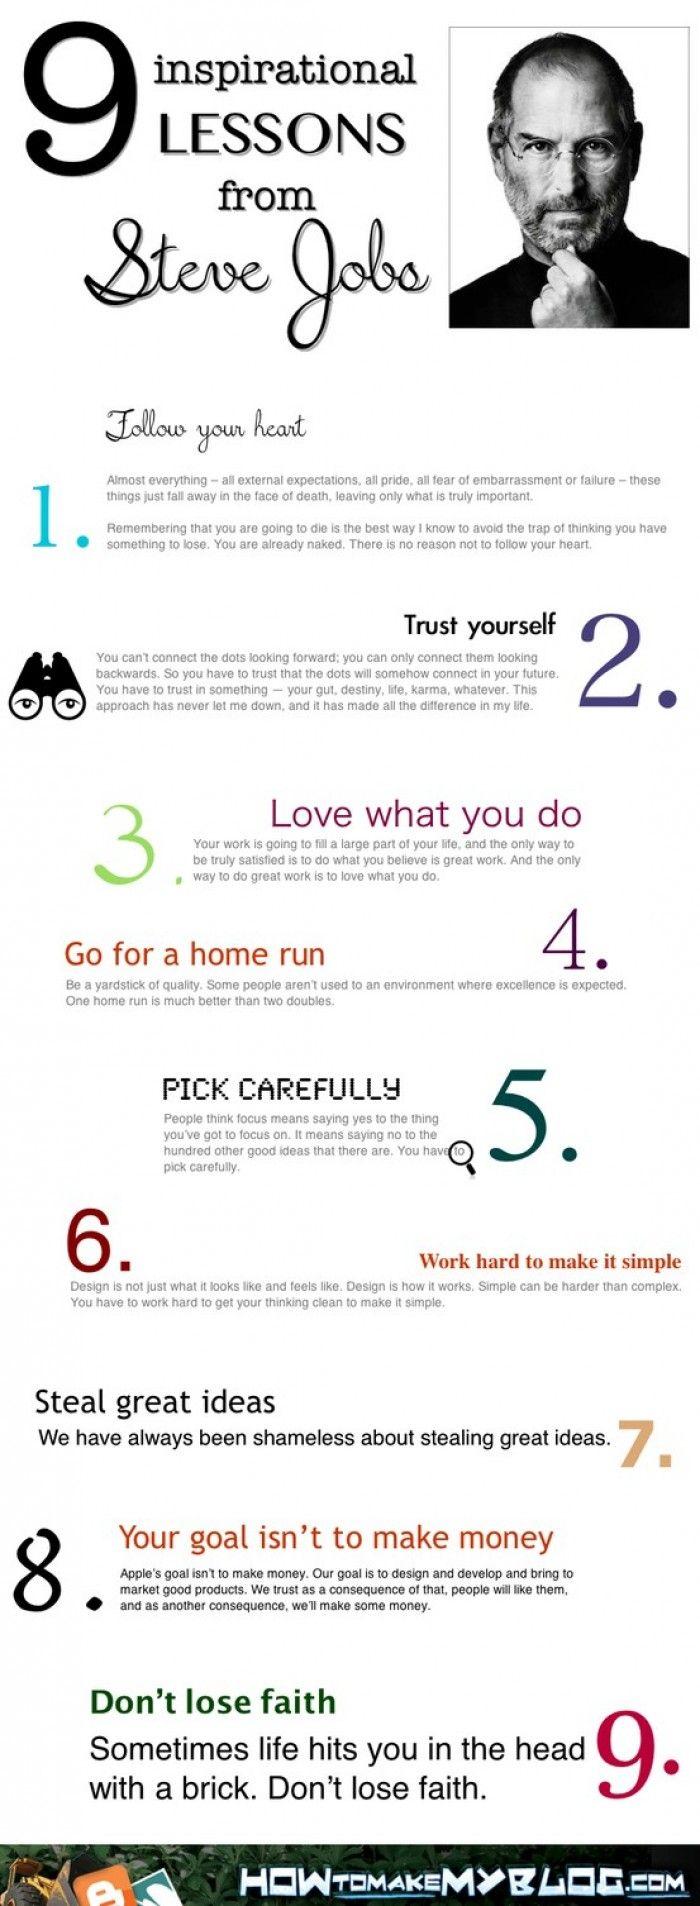 9 inspirational lessons from Steve Jobs